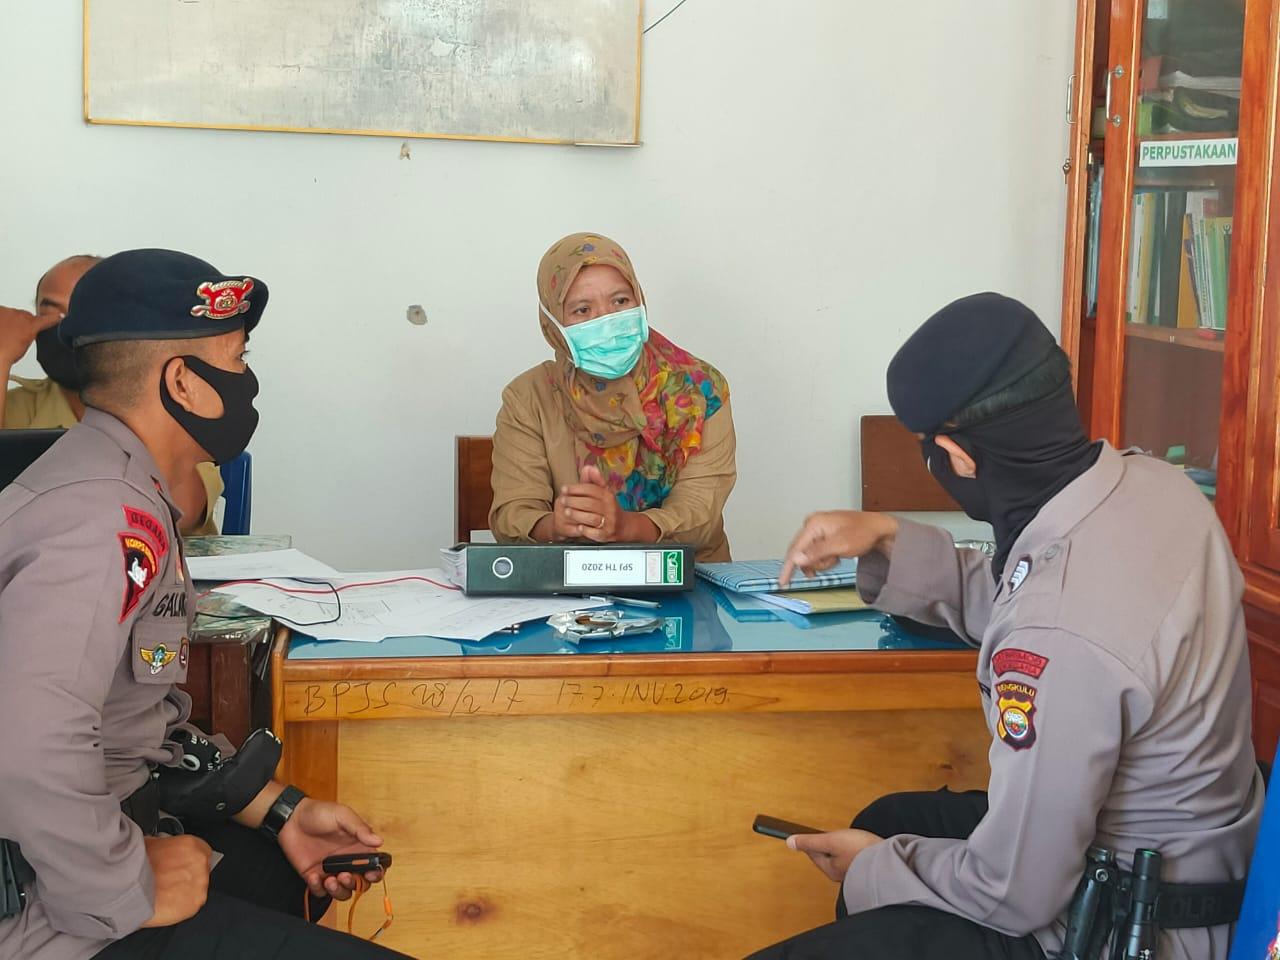 Personil KBR Gegana Satbrimobda Polda Bengkulu Lakukan Pendataan dan Zonasi Covid-19 di Lingkar Barat